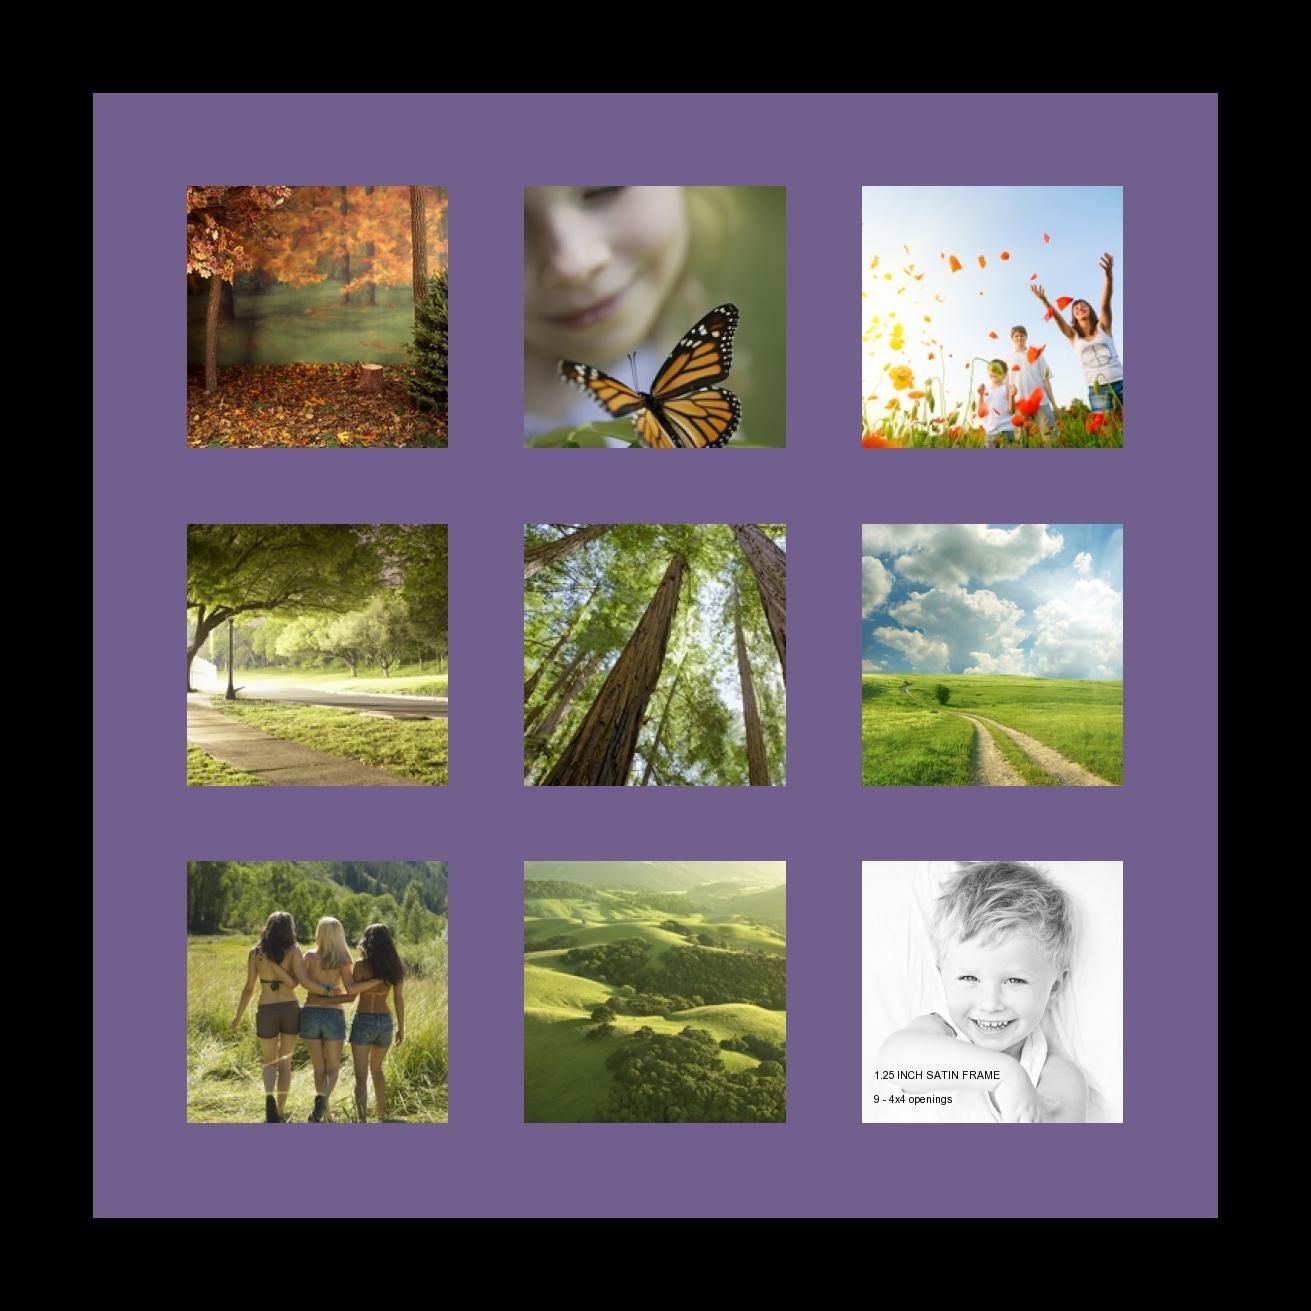 ArtToFrames アルファベット写真画像フレーム  5 x 7インチ開口部9つ サテンブラックフレーム Grape パープル Single-Multimat-2147-849-FRBW26079 B00IX2I15S Grape 9 - 4x4 - (2147) 9 - 4x4 - (2147) Grape